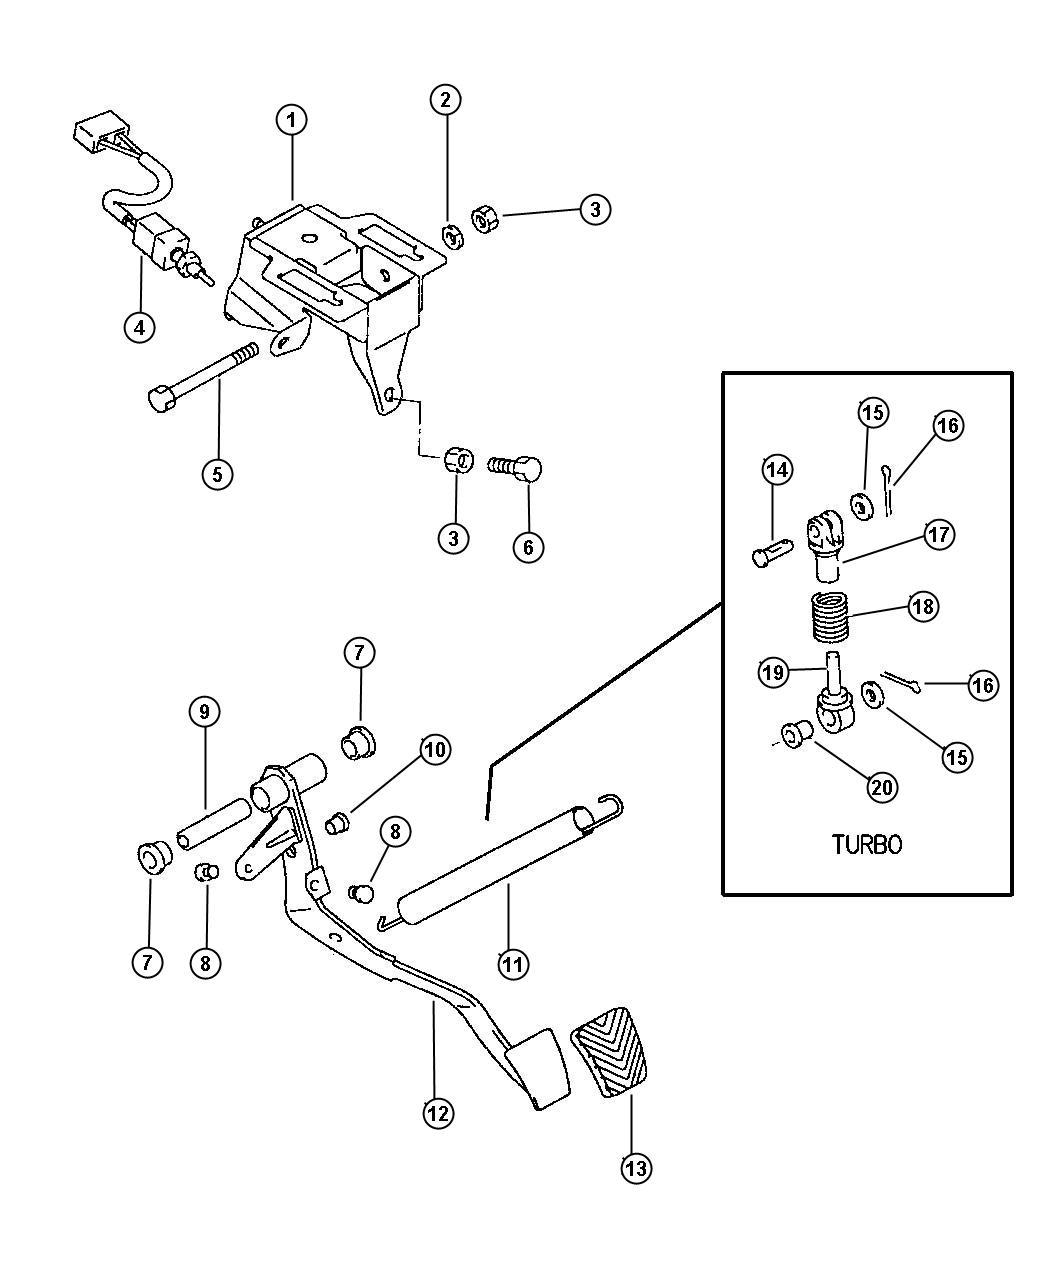 Dodge Avenger Bushing Used For Clutch And Brake